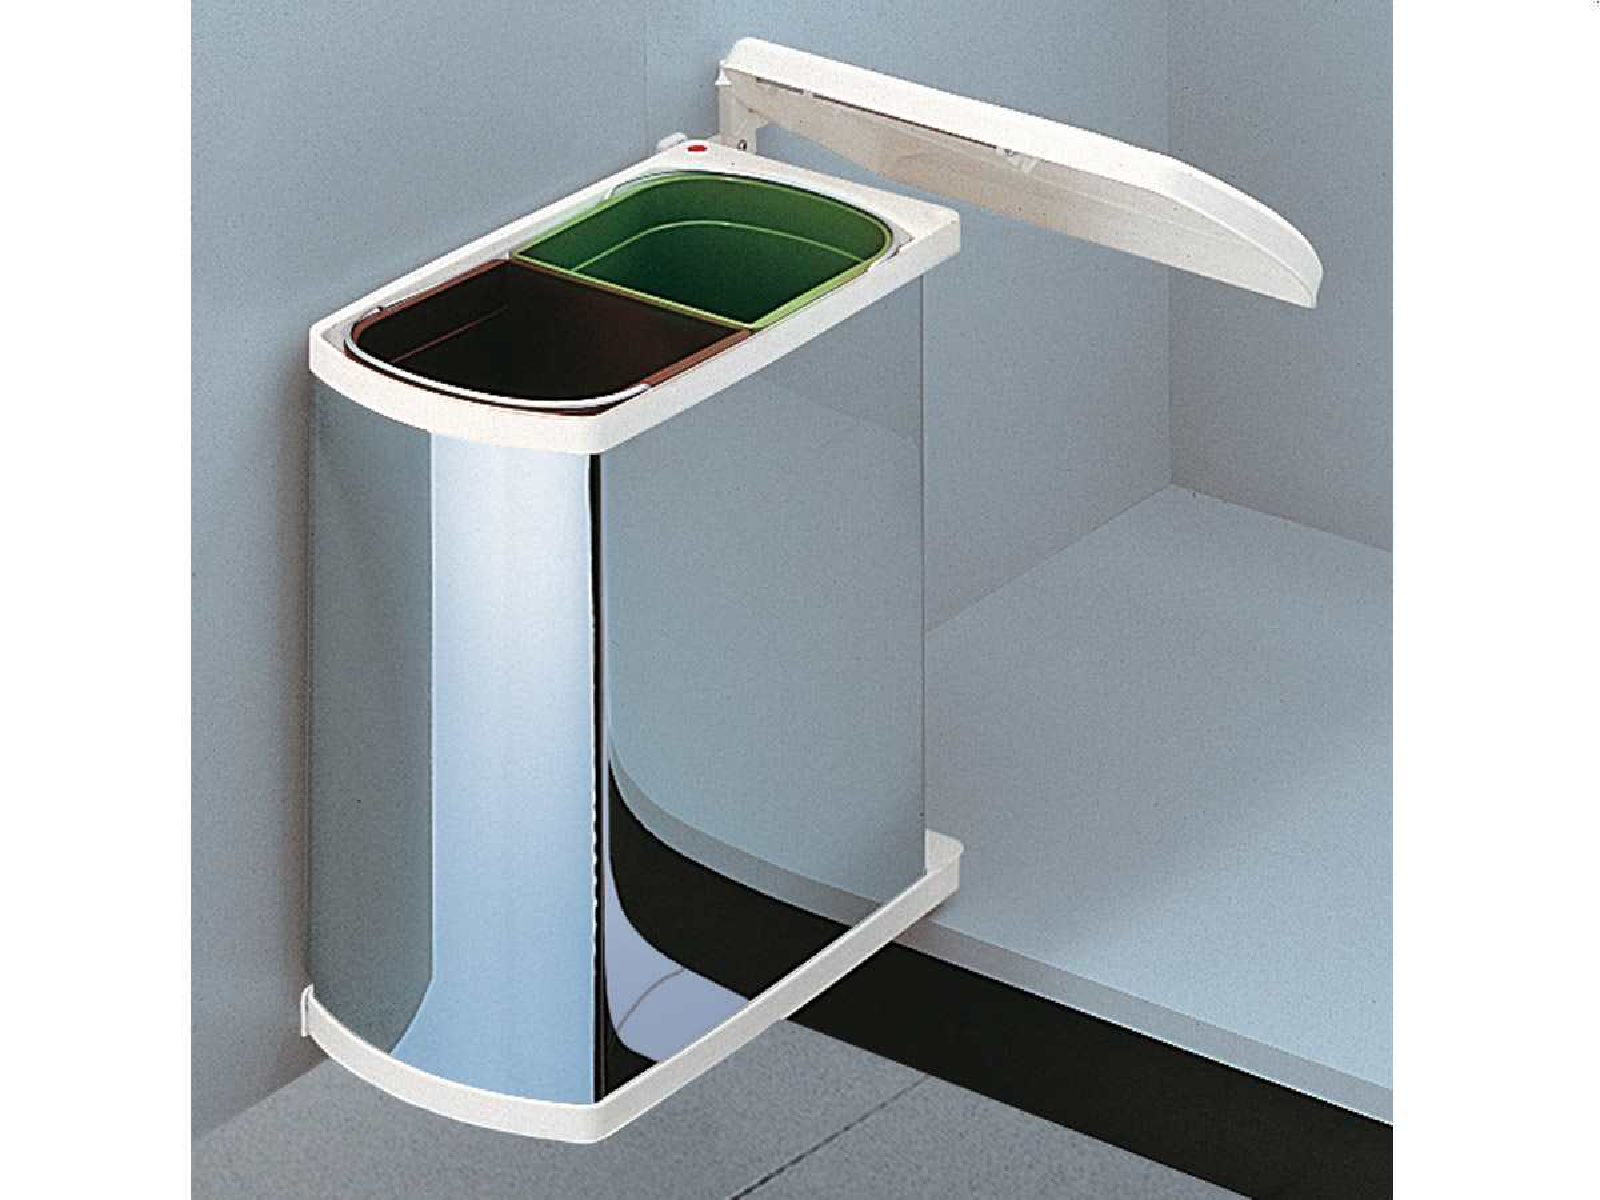 hailo koflex duo 3416 90 einbau abfallsammler. Black Bedroom Furniture Sets. Home Design Ideas